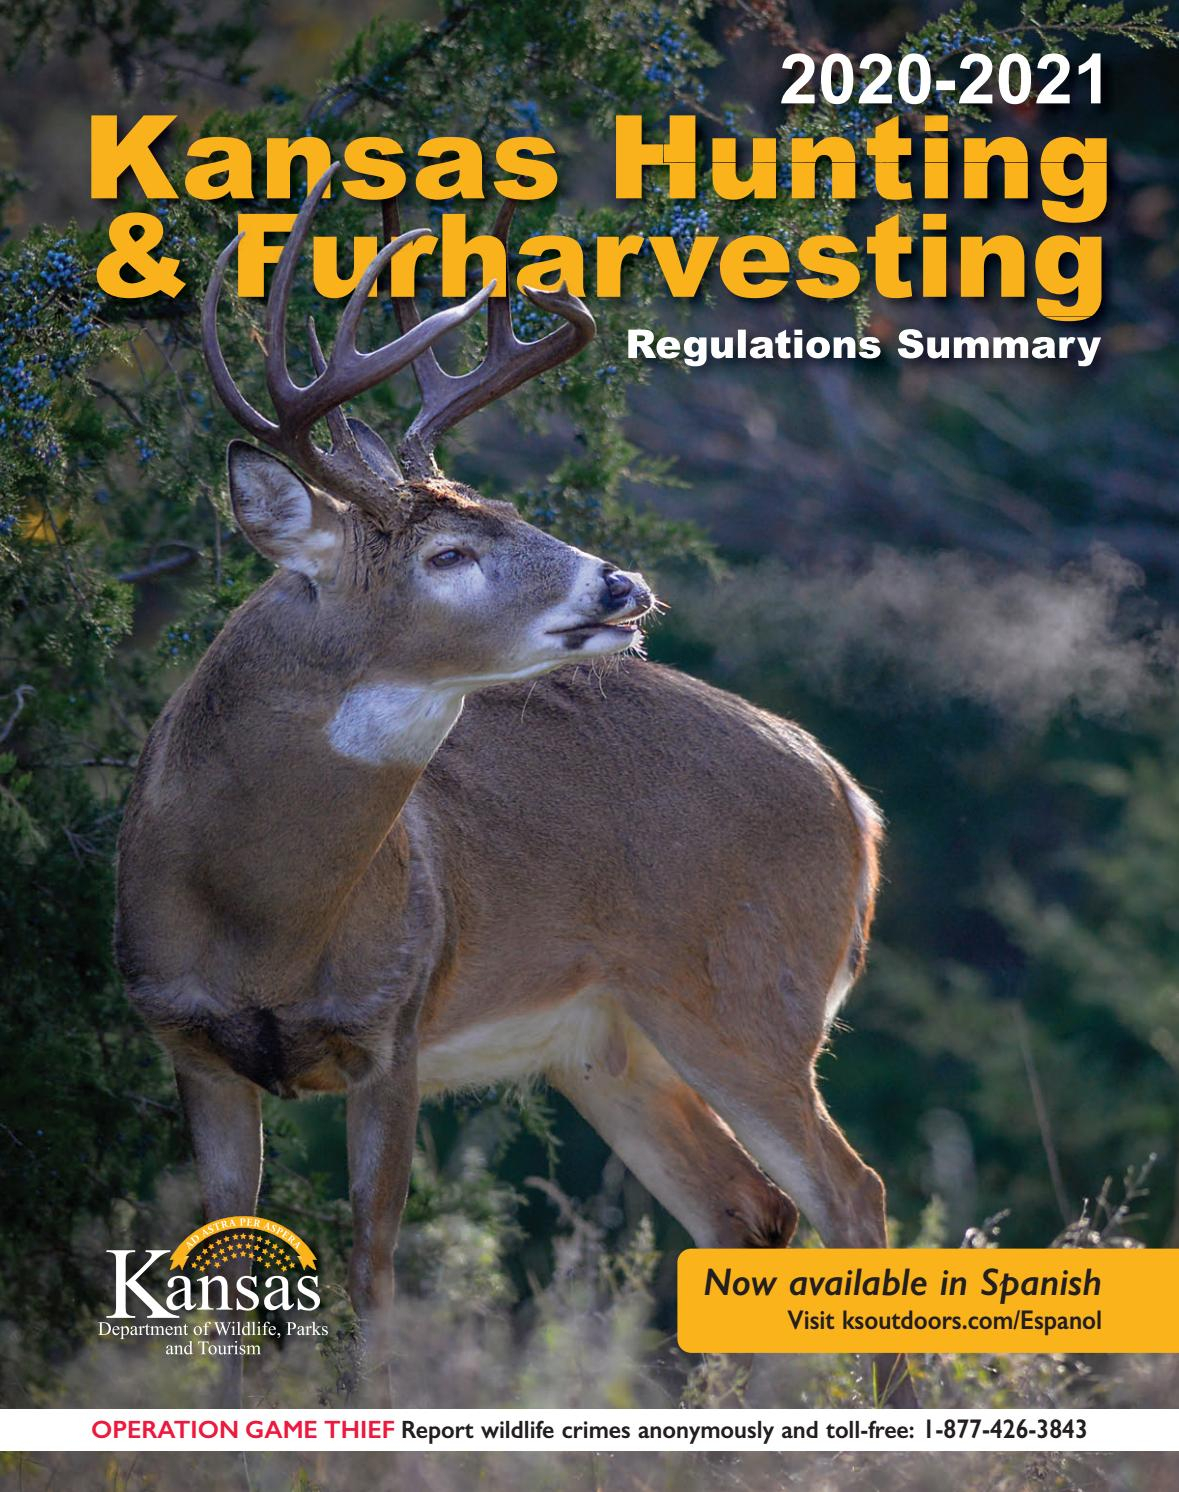 2020-2021 Kansas Hunting & Furharvesting Regulations Summary in Rut Whitetail 2021